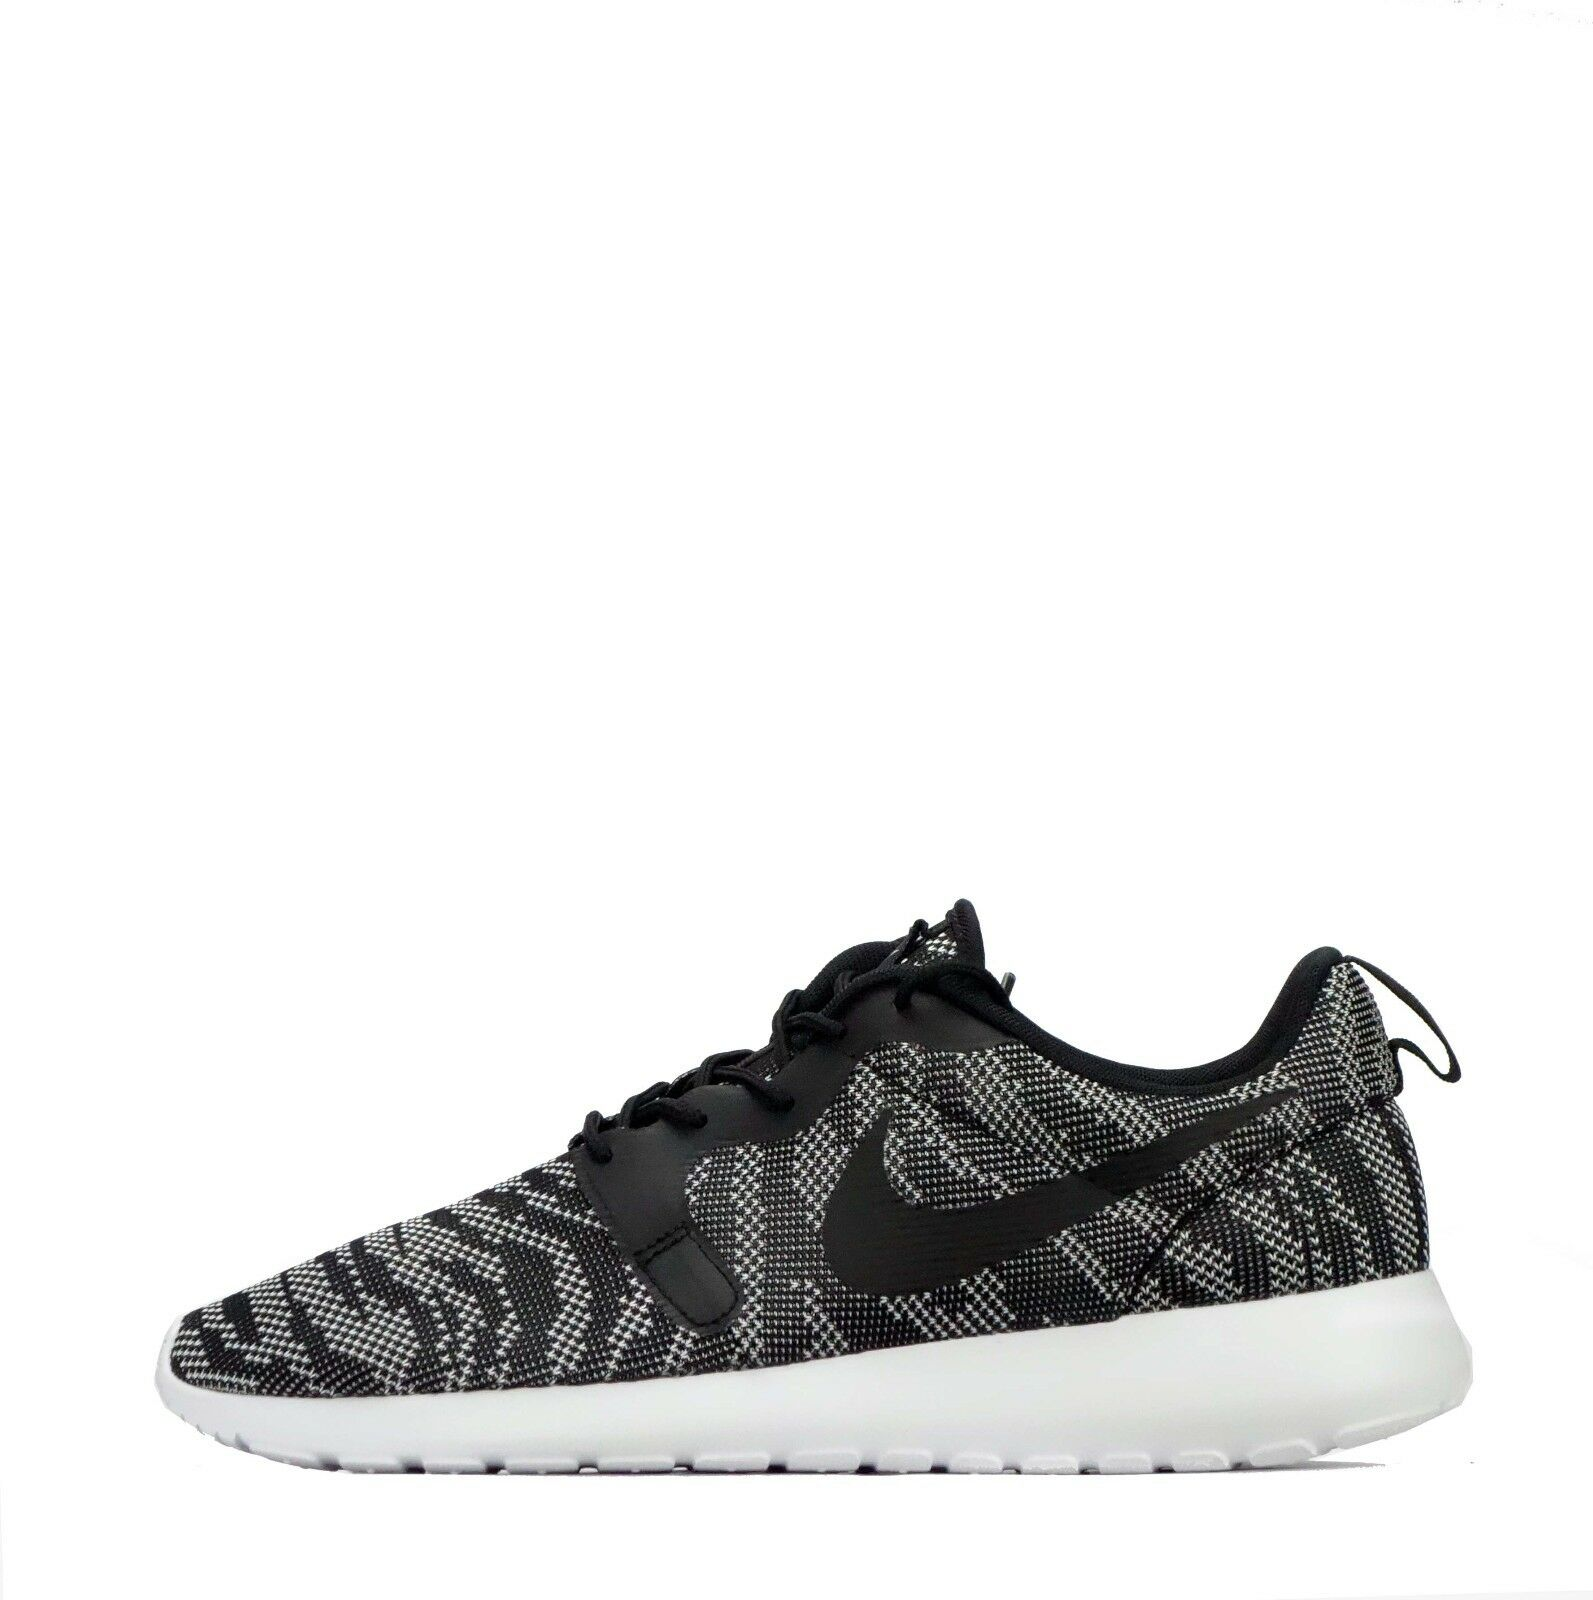 Nike Roshe Run Jacquard Women's Shoes White/Black